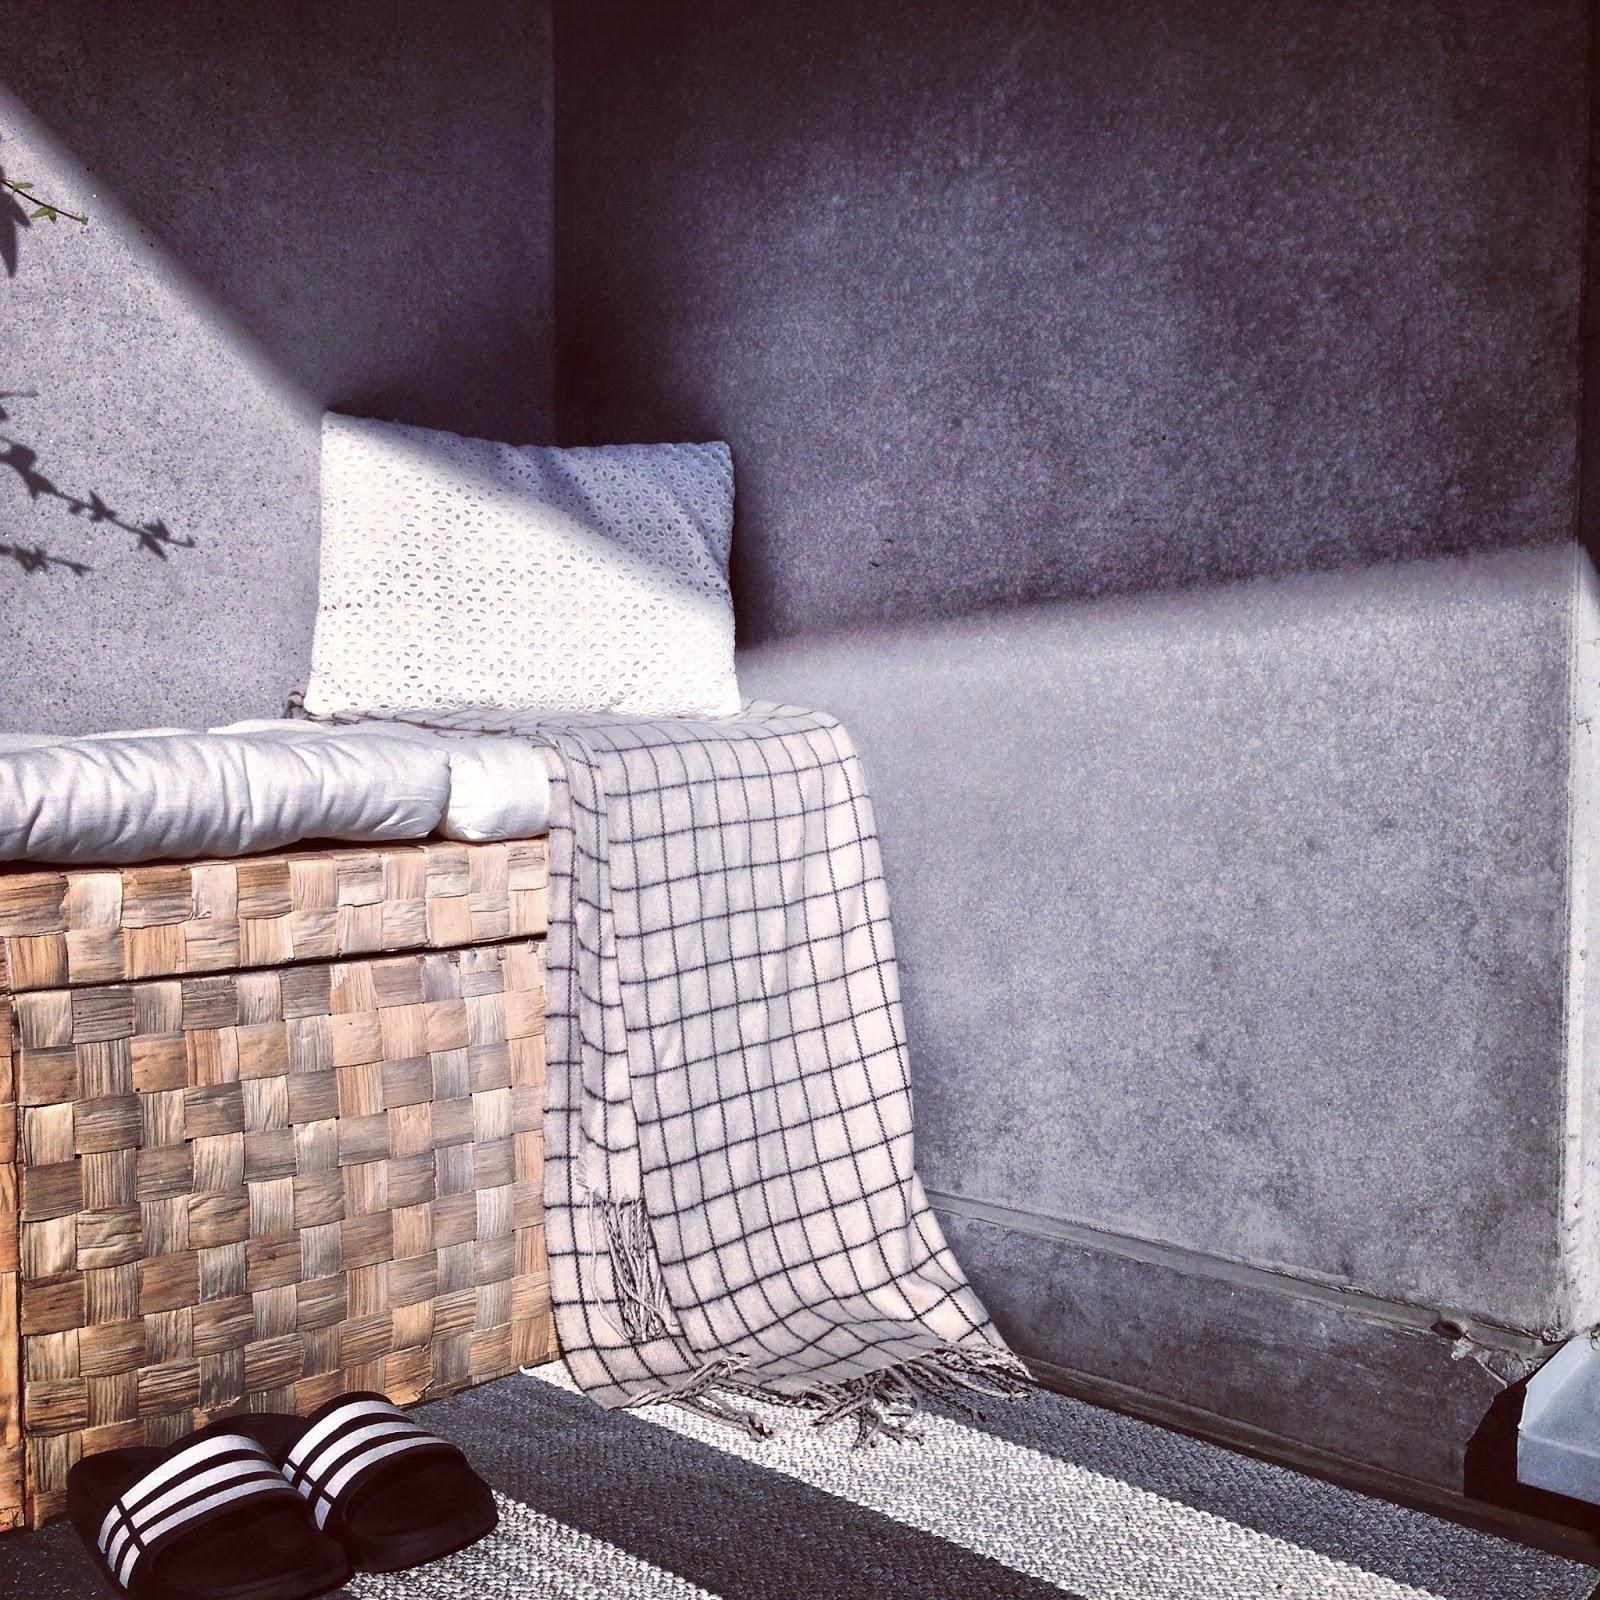 adidas, flipflop, Monki huivi, Monki, scarf, Monkiscarf, Monkistyle, balcony, balkong, concrete, betong,